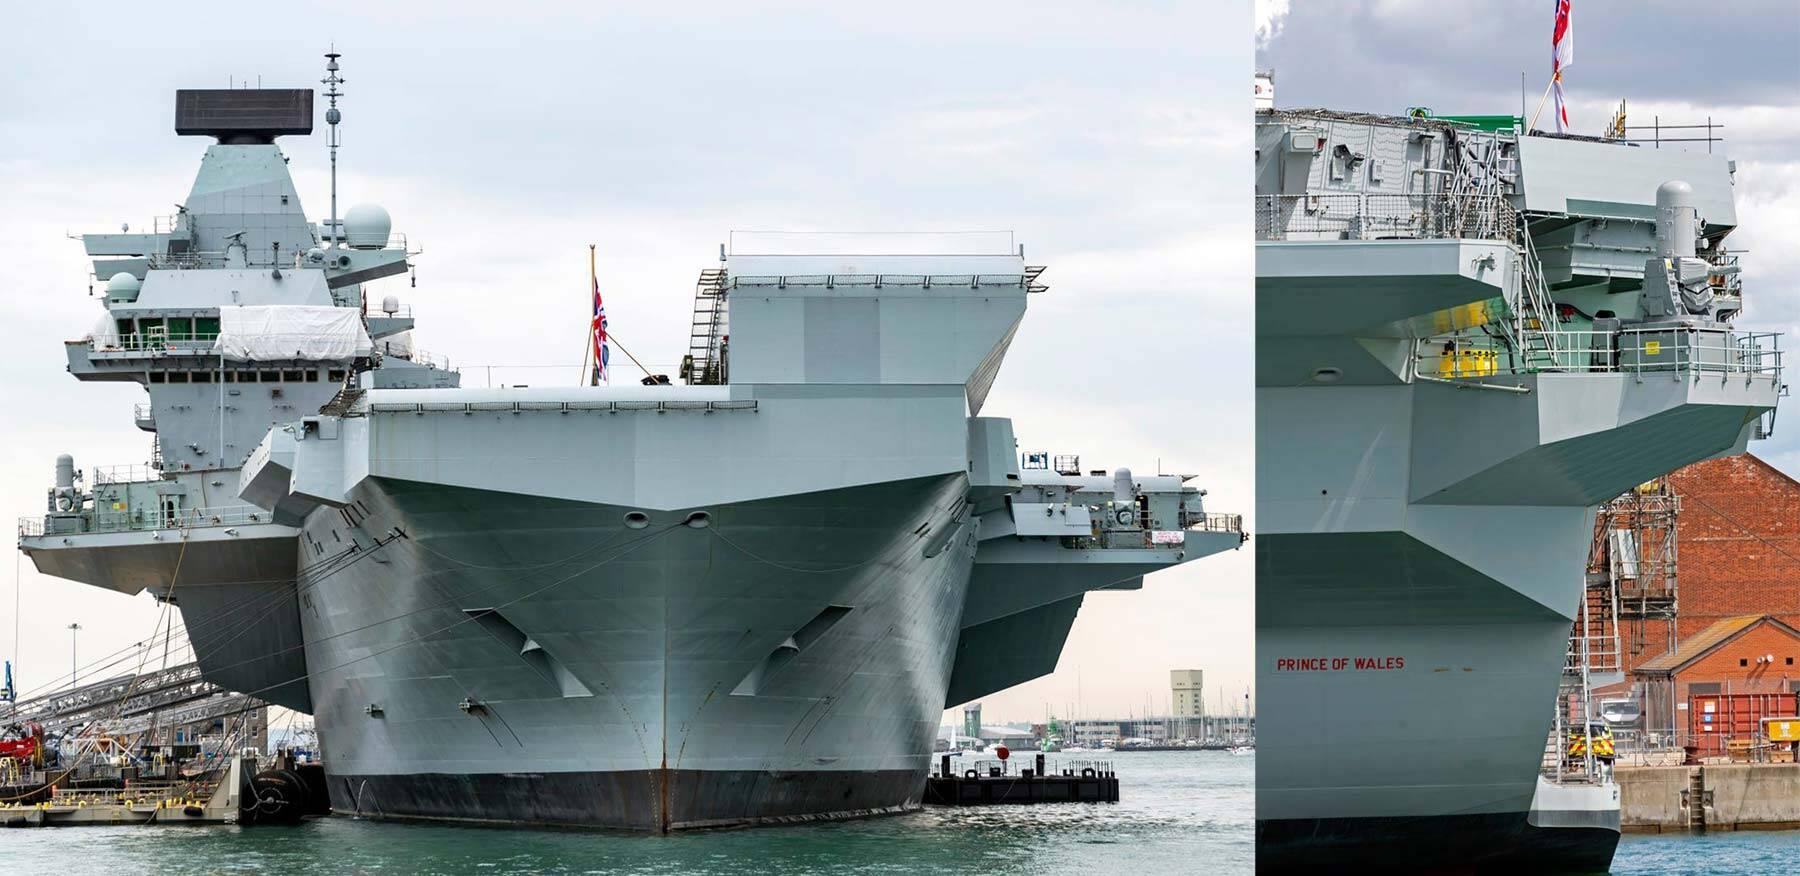 Phalanx HMS Prince of Wales